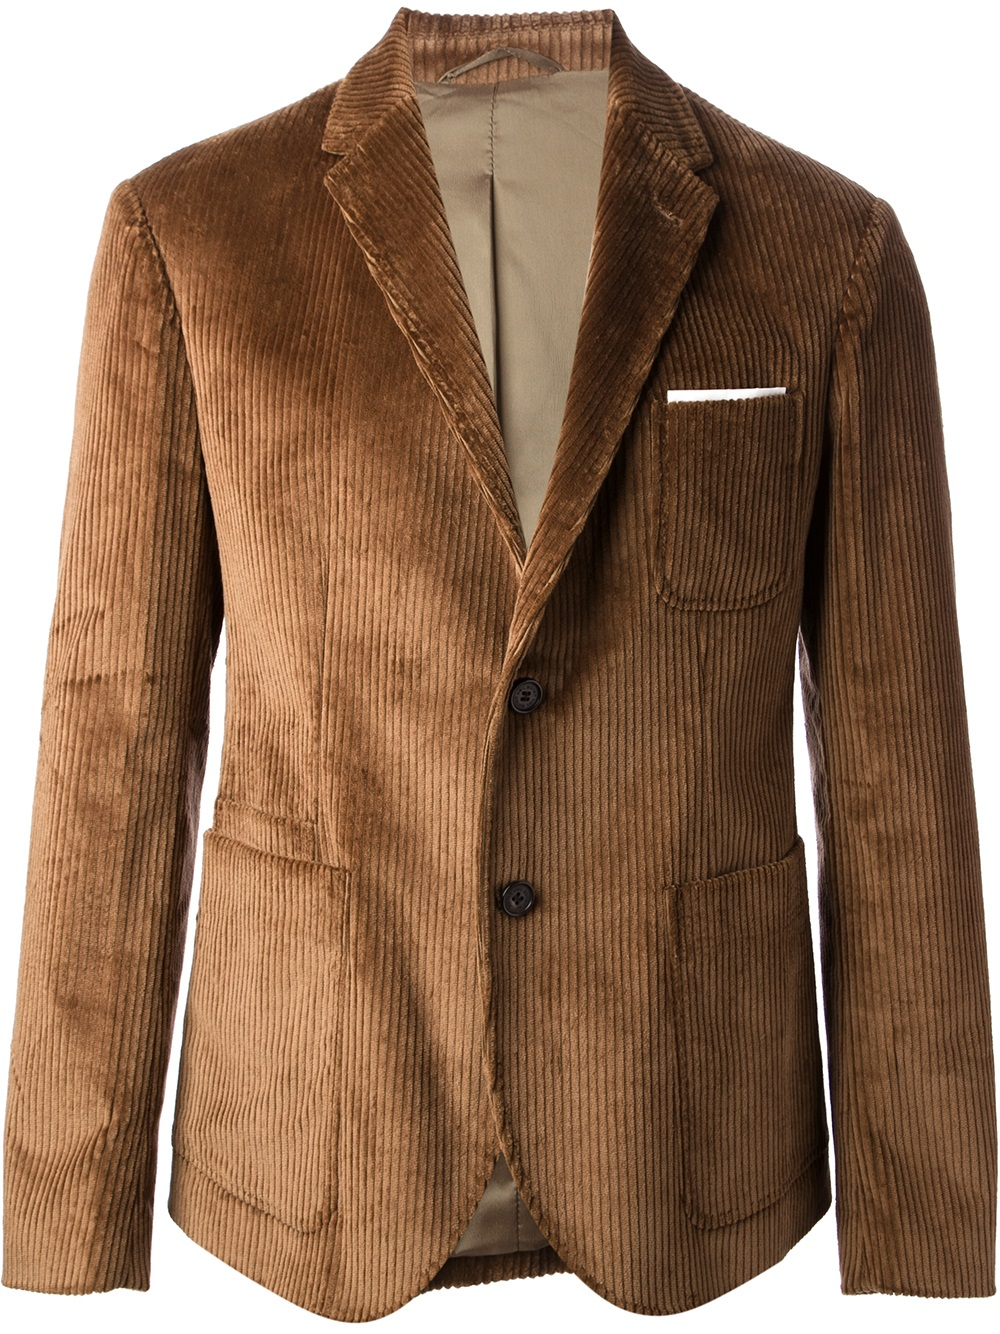 Lyst Neil Barrett Corduroy Blazer In Brown For Men